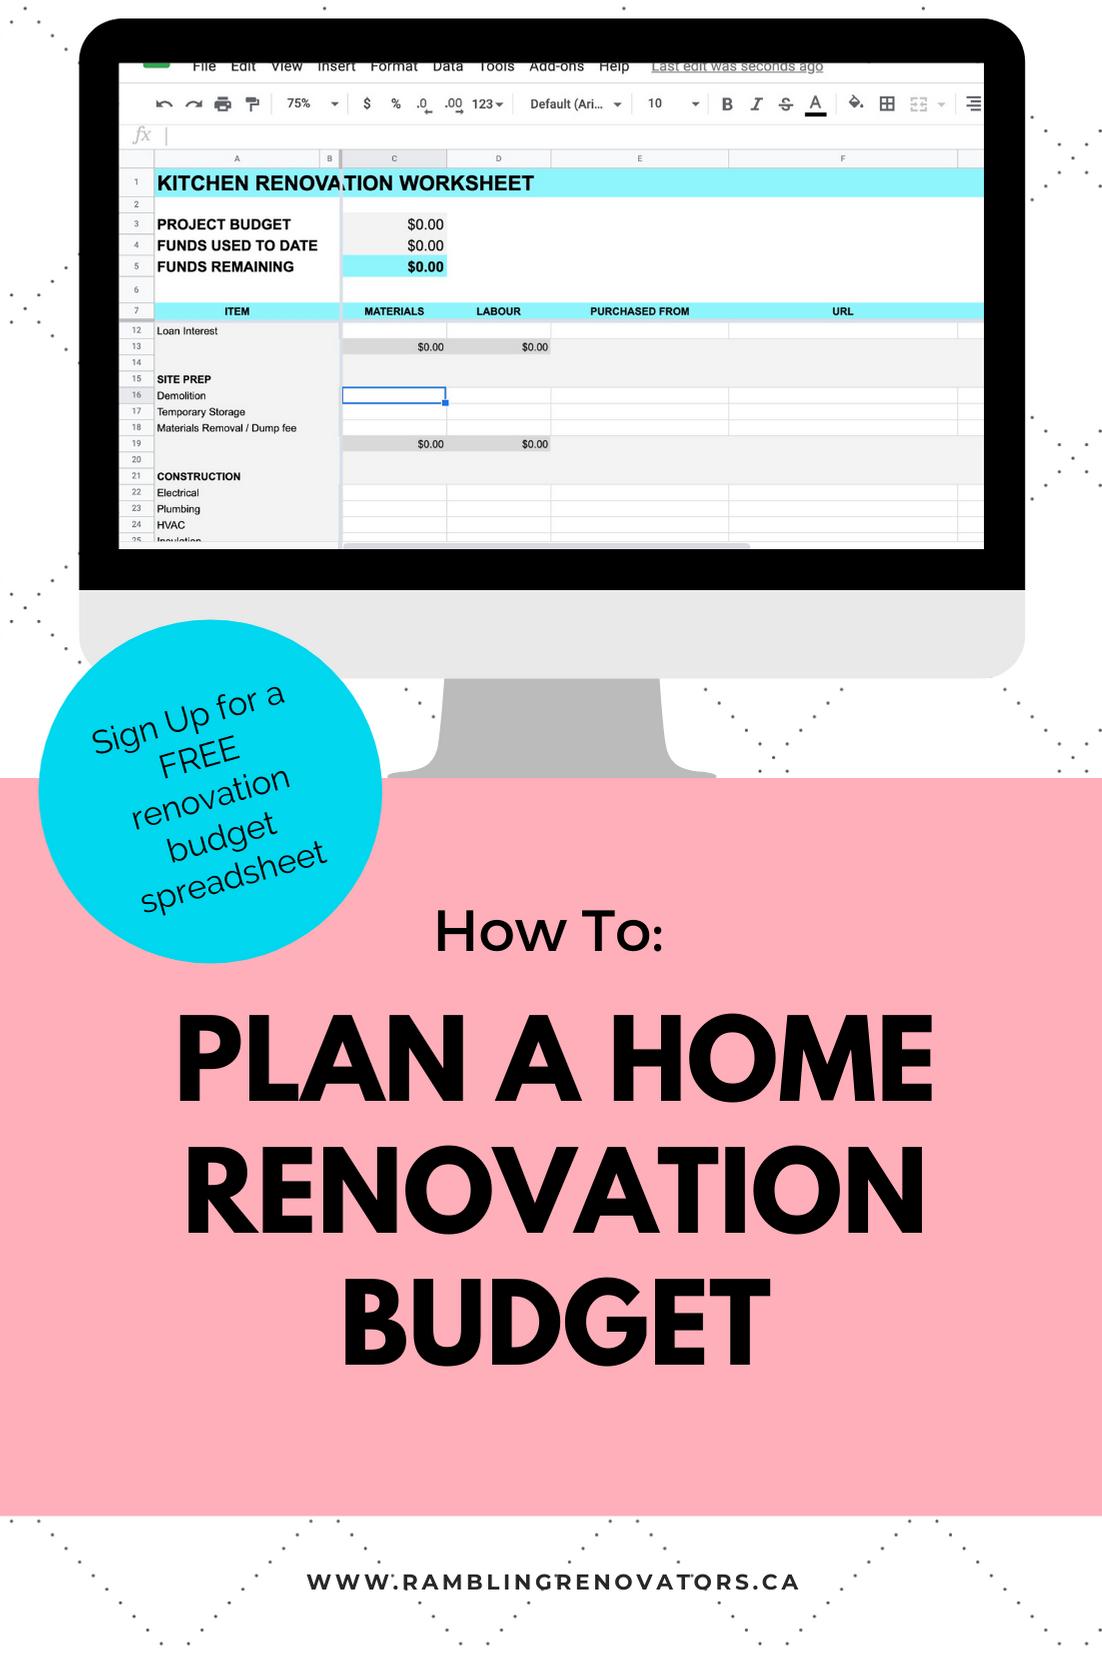 home renovation budget template, renovation template excel, free home renovation budget template